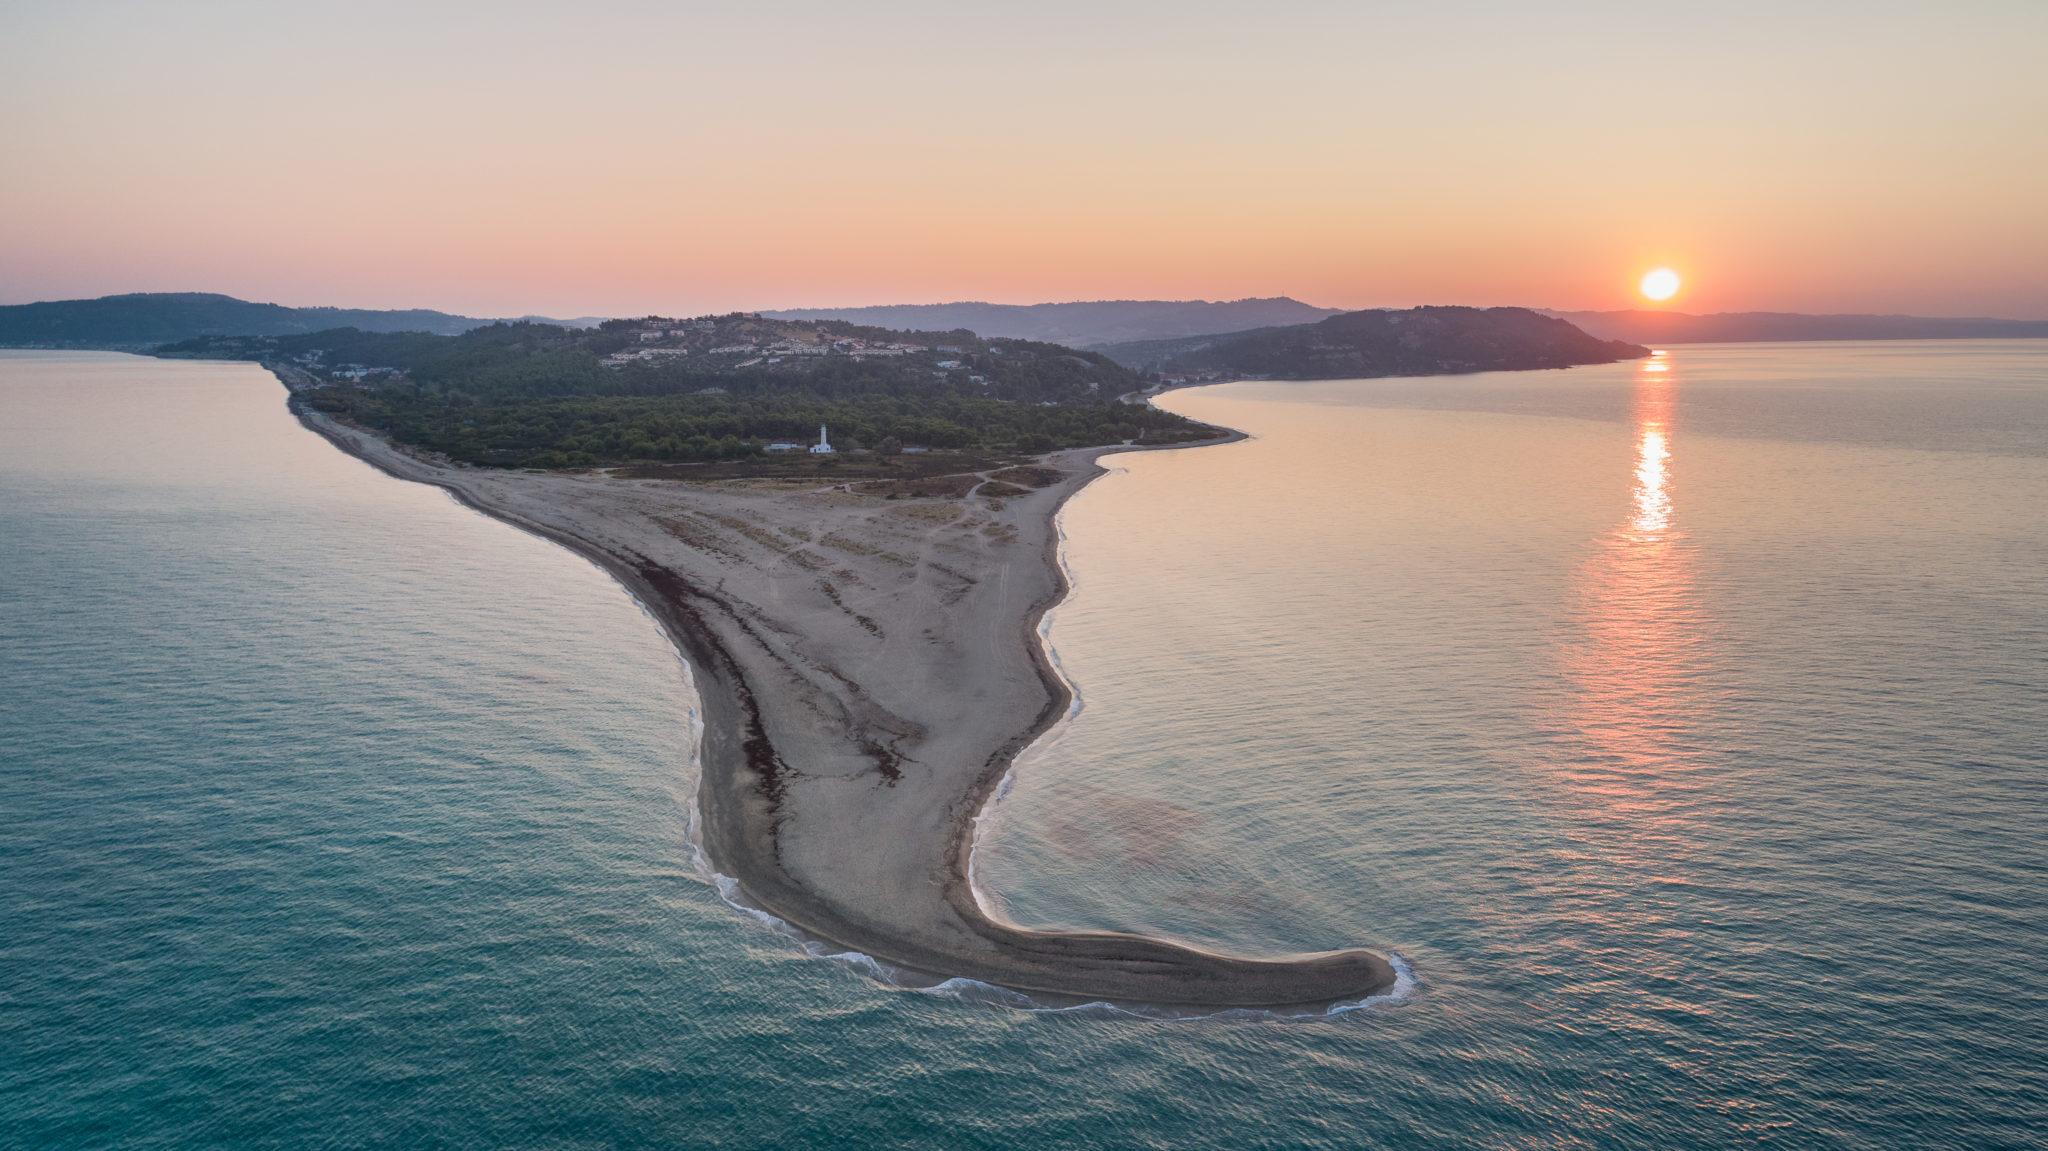 Sonnenaufgang über der Halbinsel Kassandra